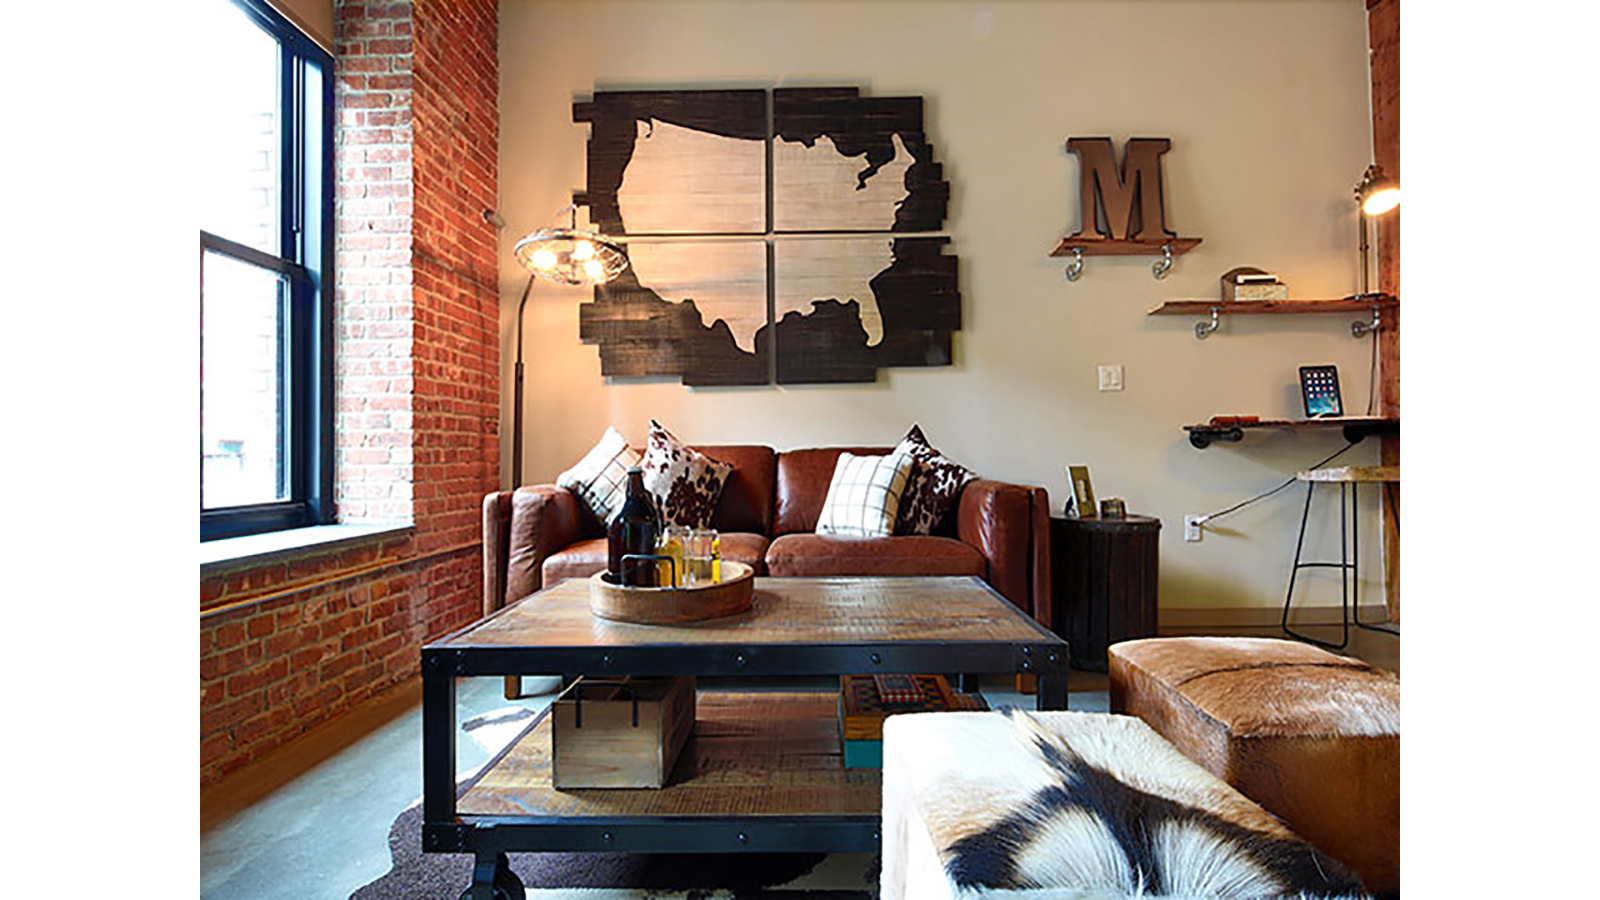 Modera Lofts, 350 Warren Street